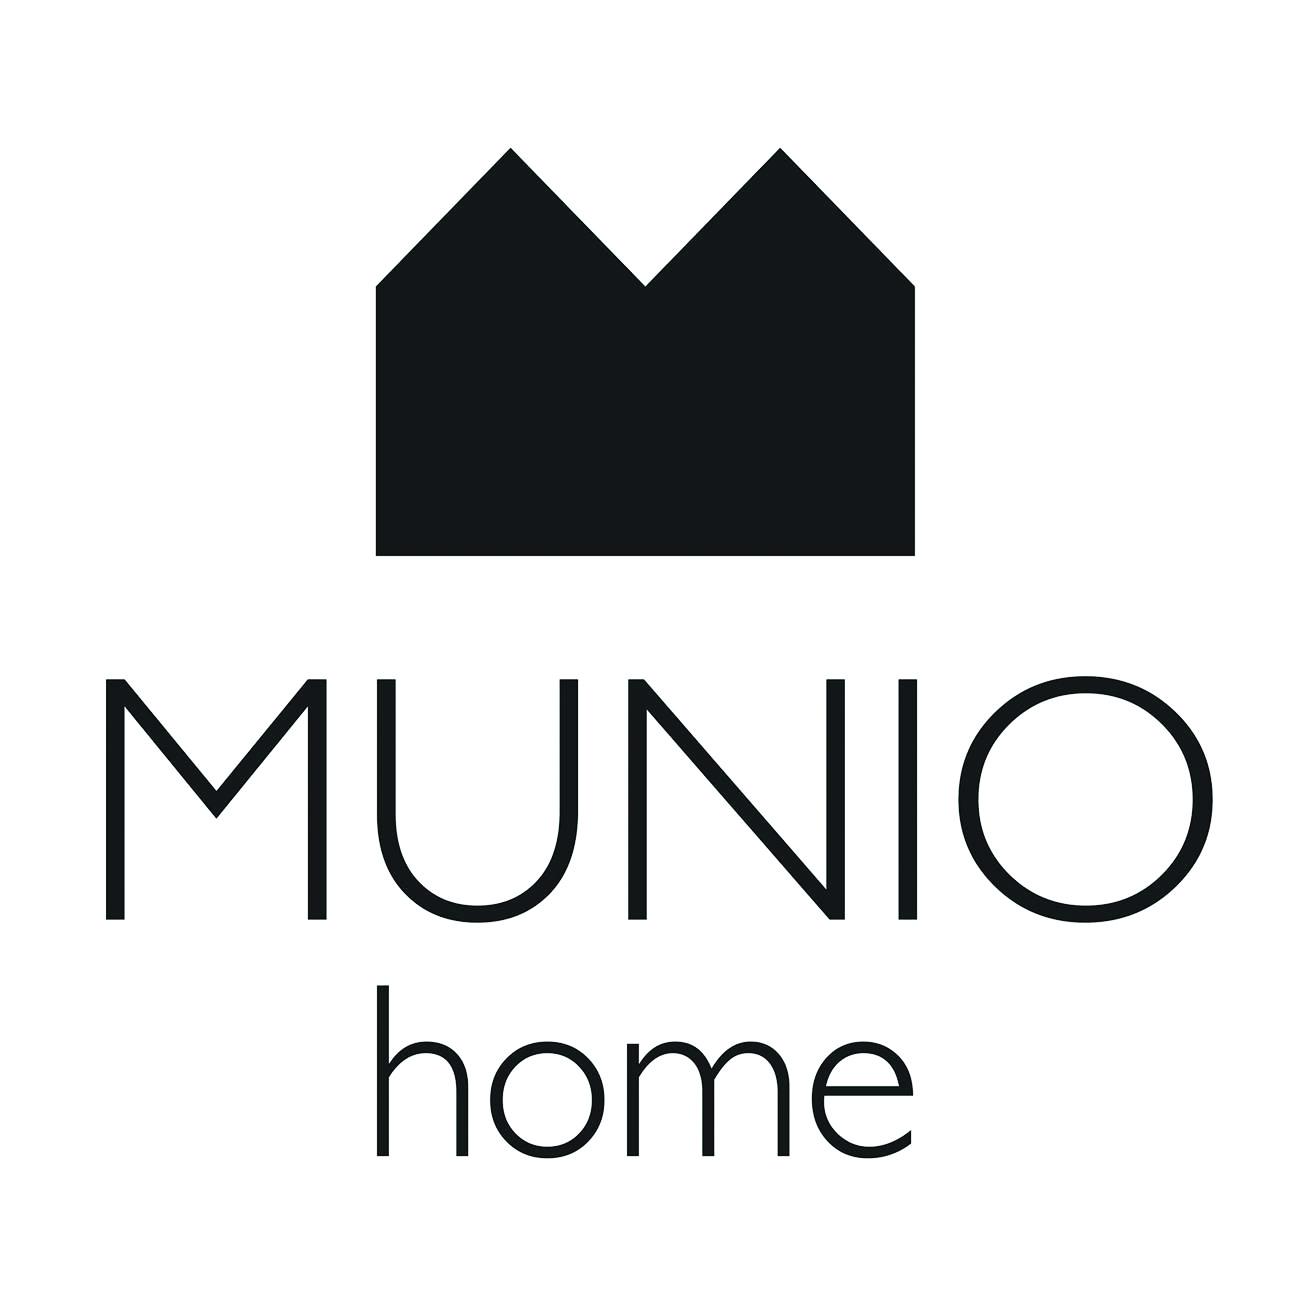 LOGO_Munio Home jpg (1)